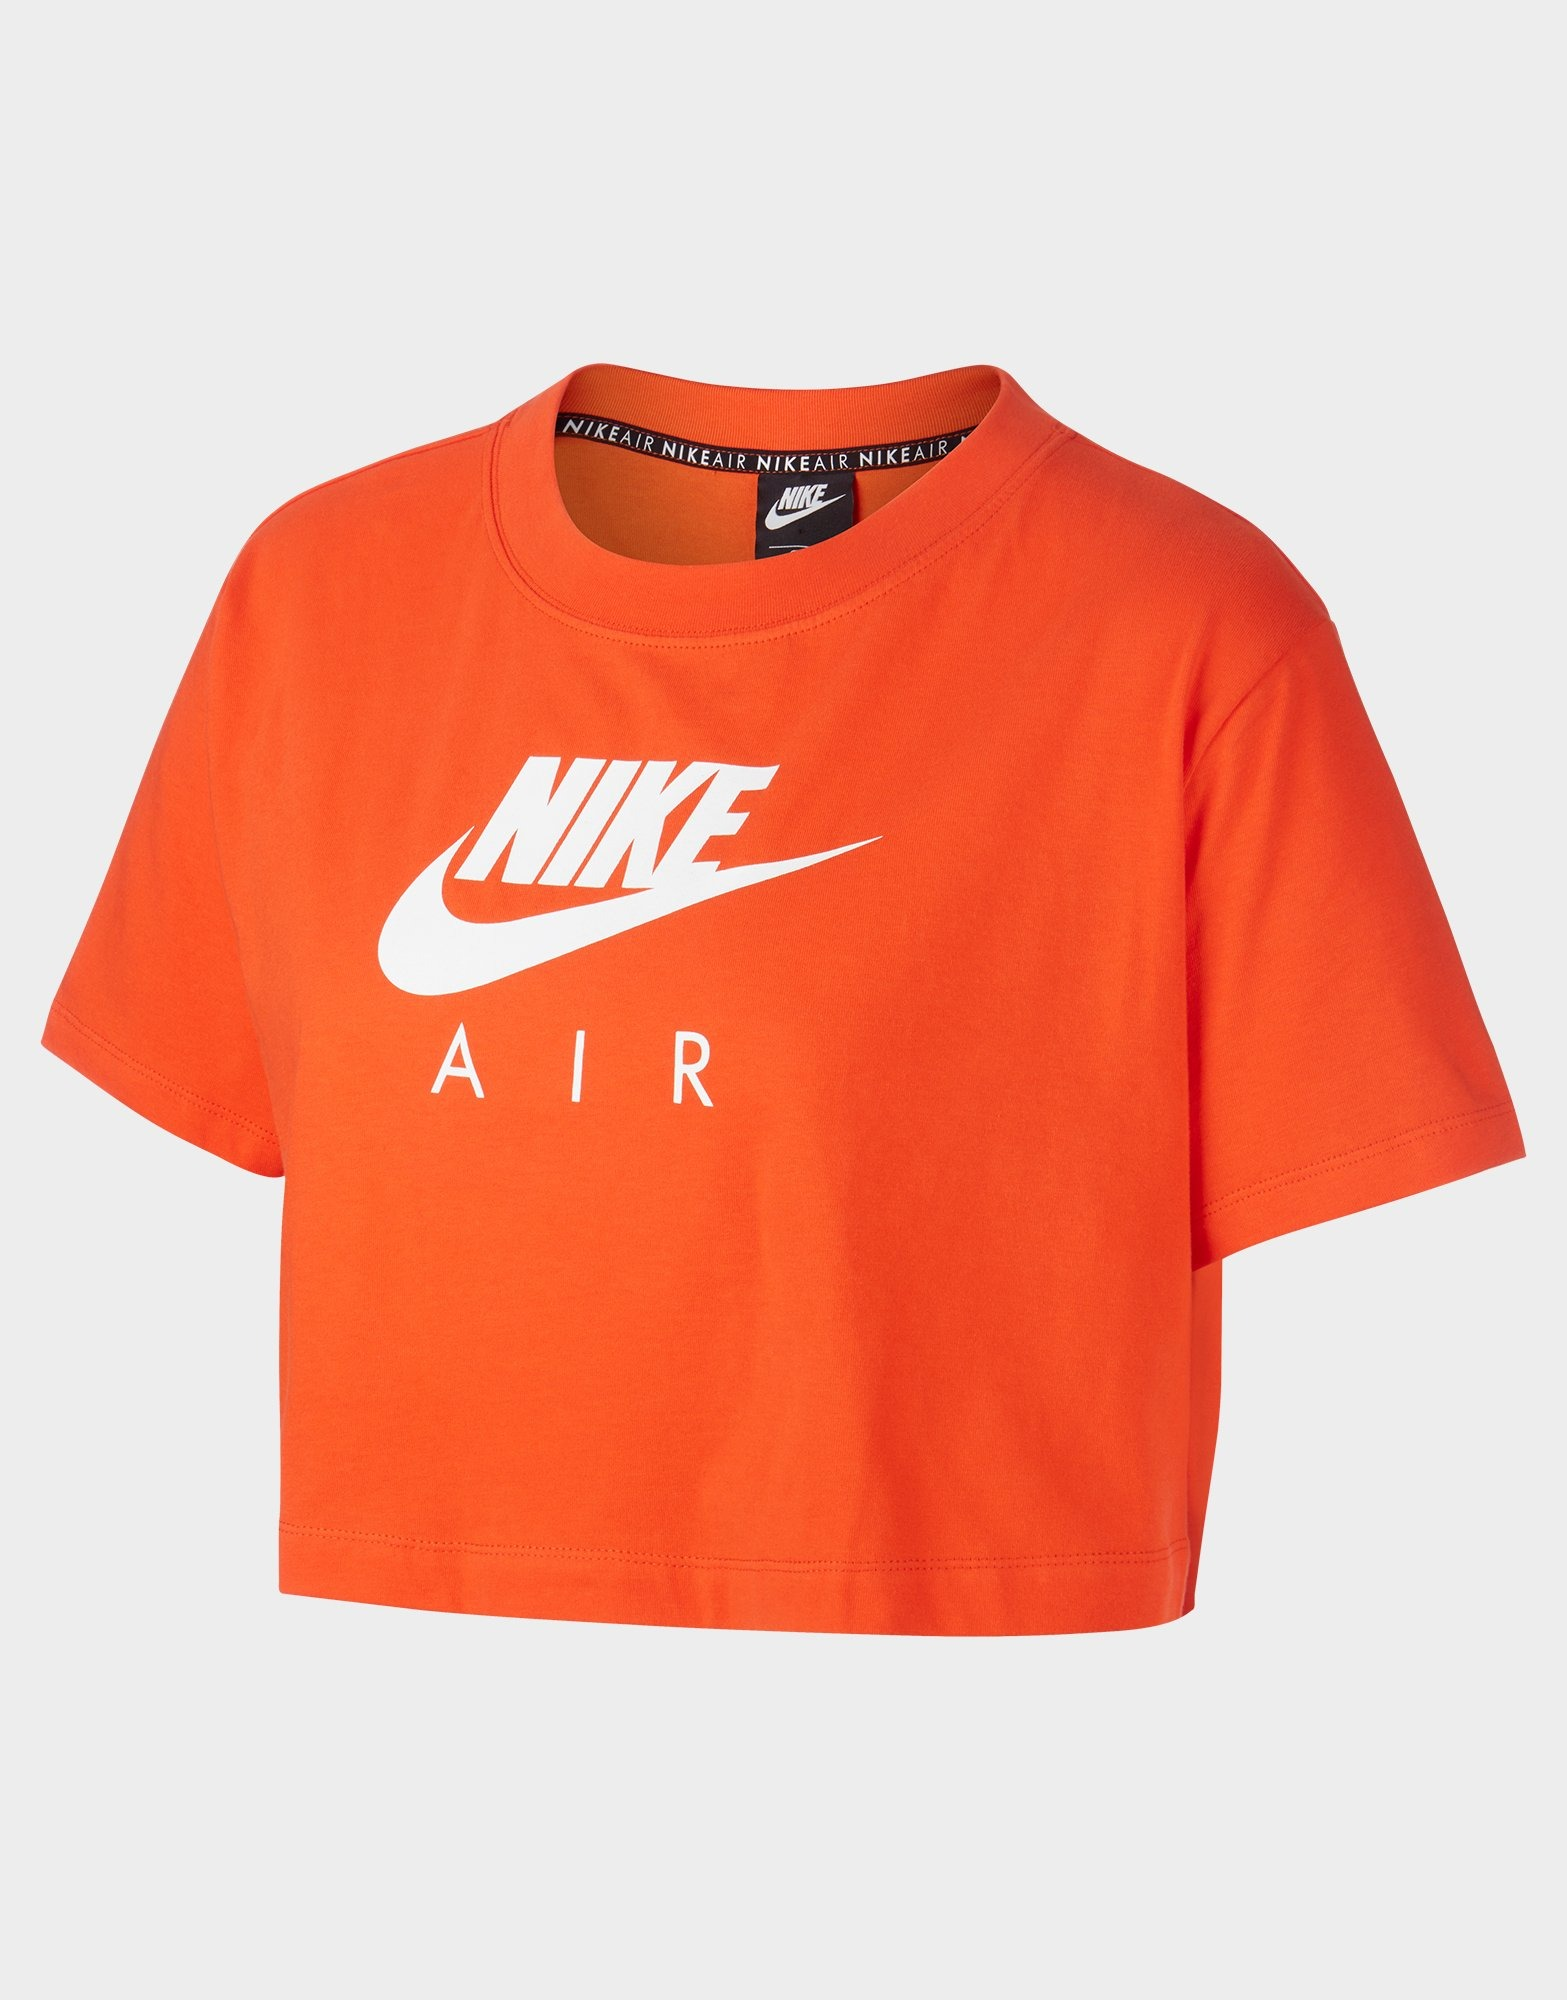 womens nike sweatshirt orange